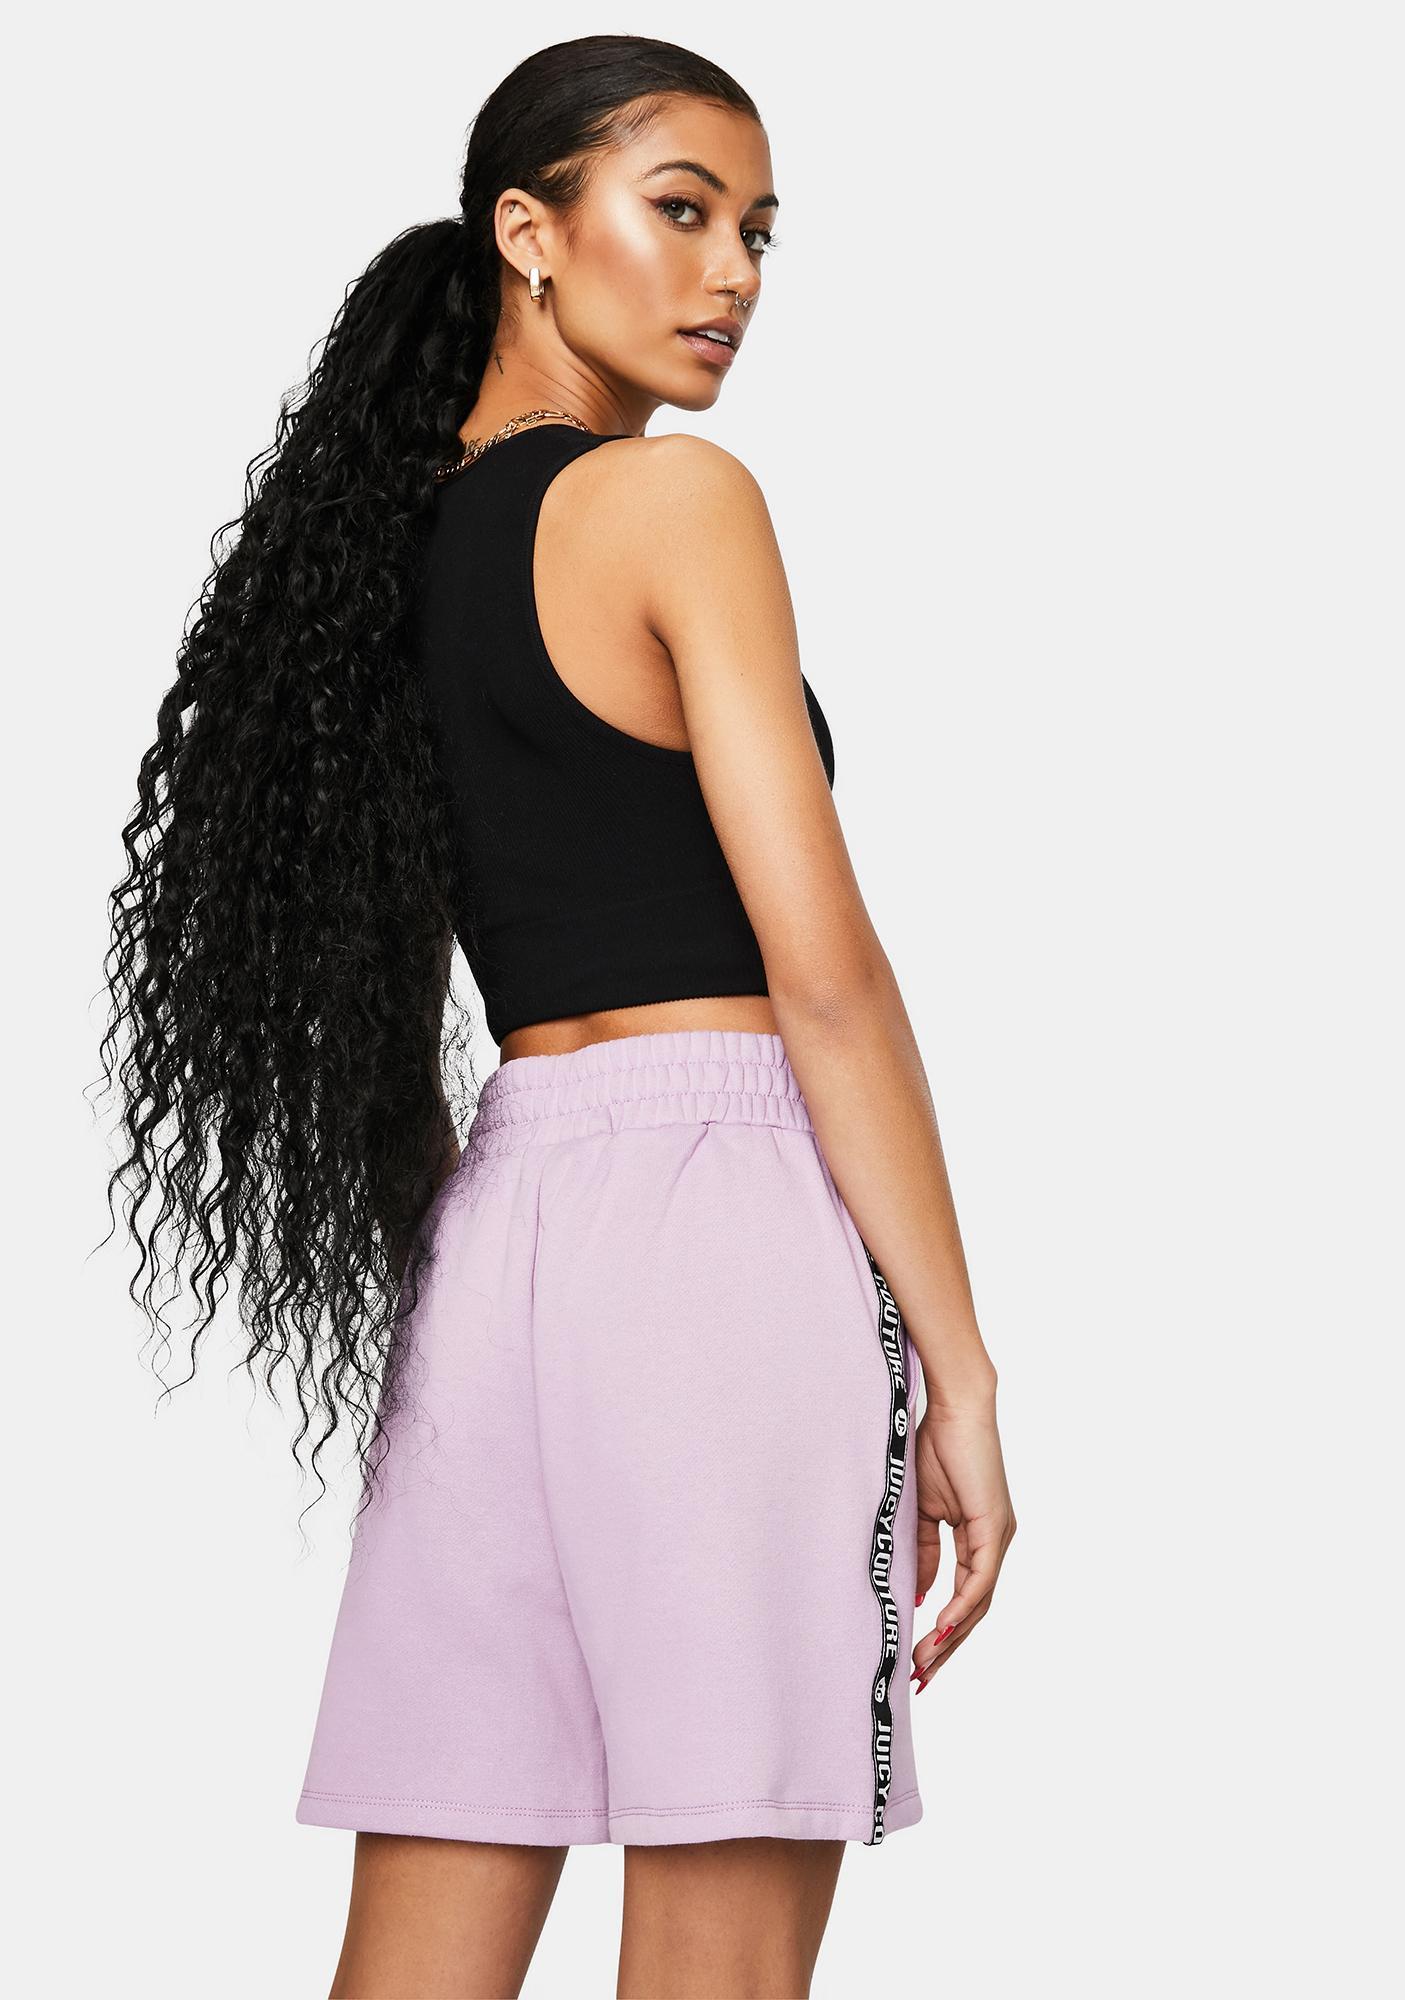 JUICY COUTURE Lavender Lipstick Fleece Shorts